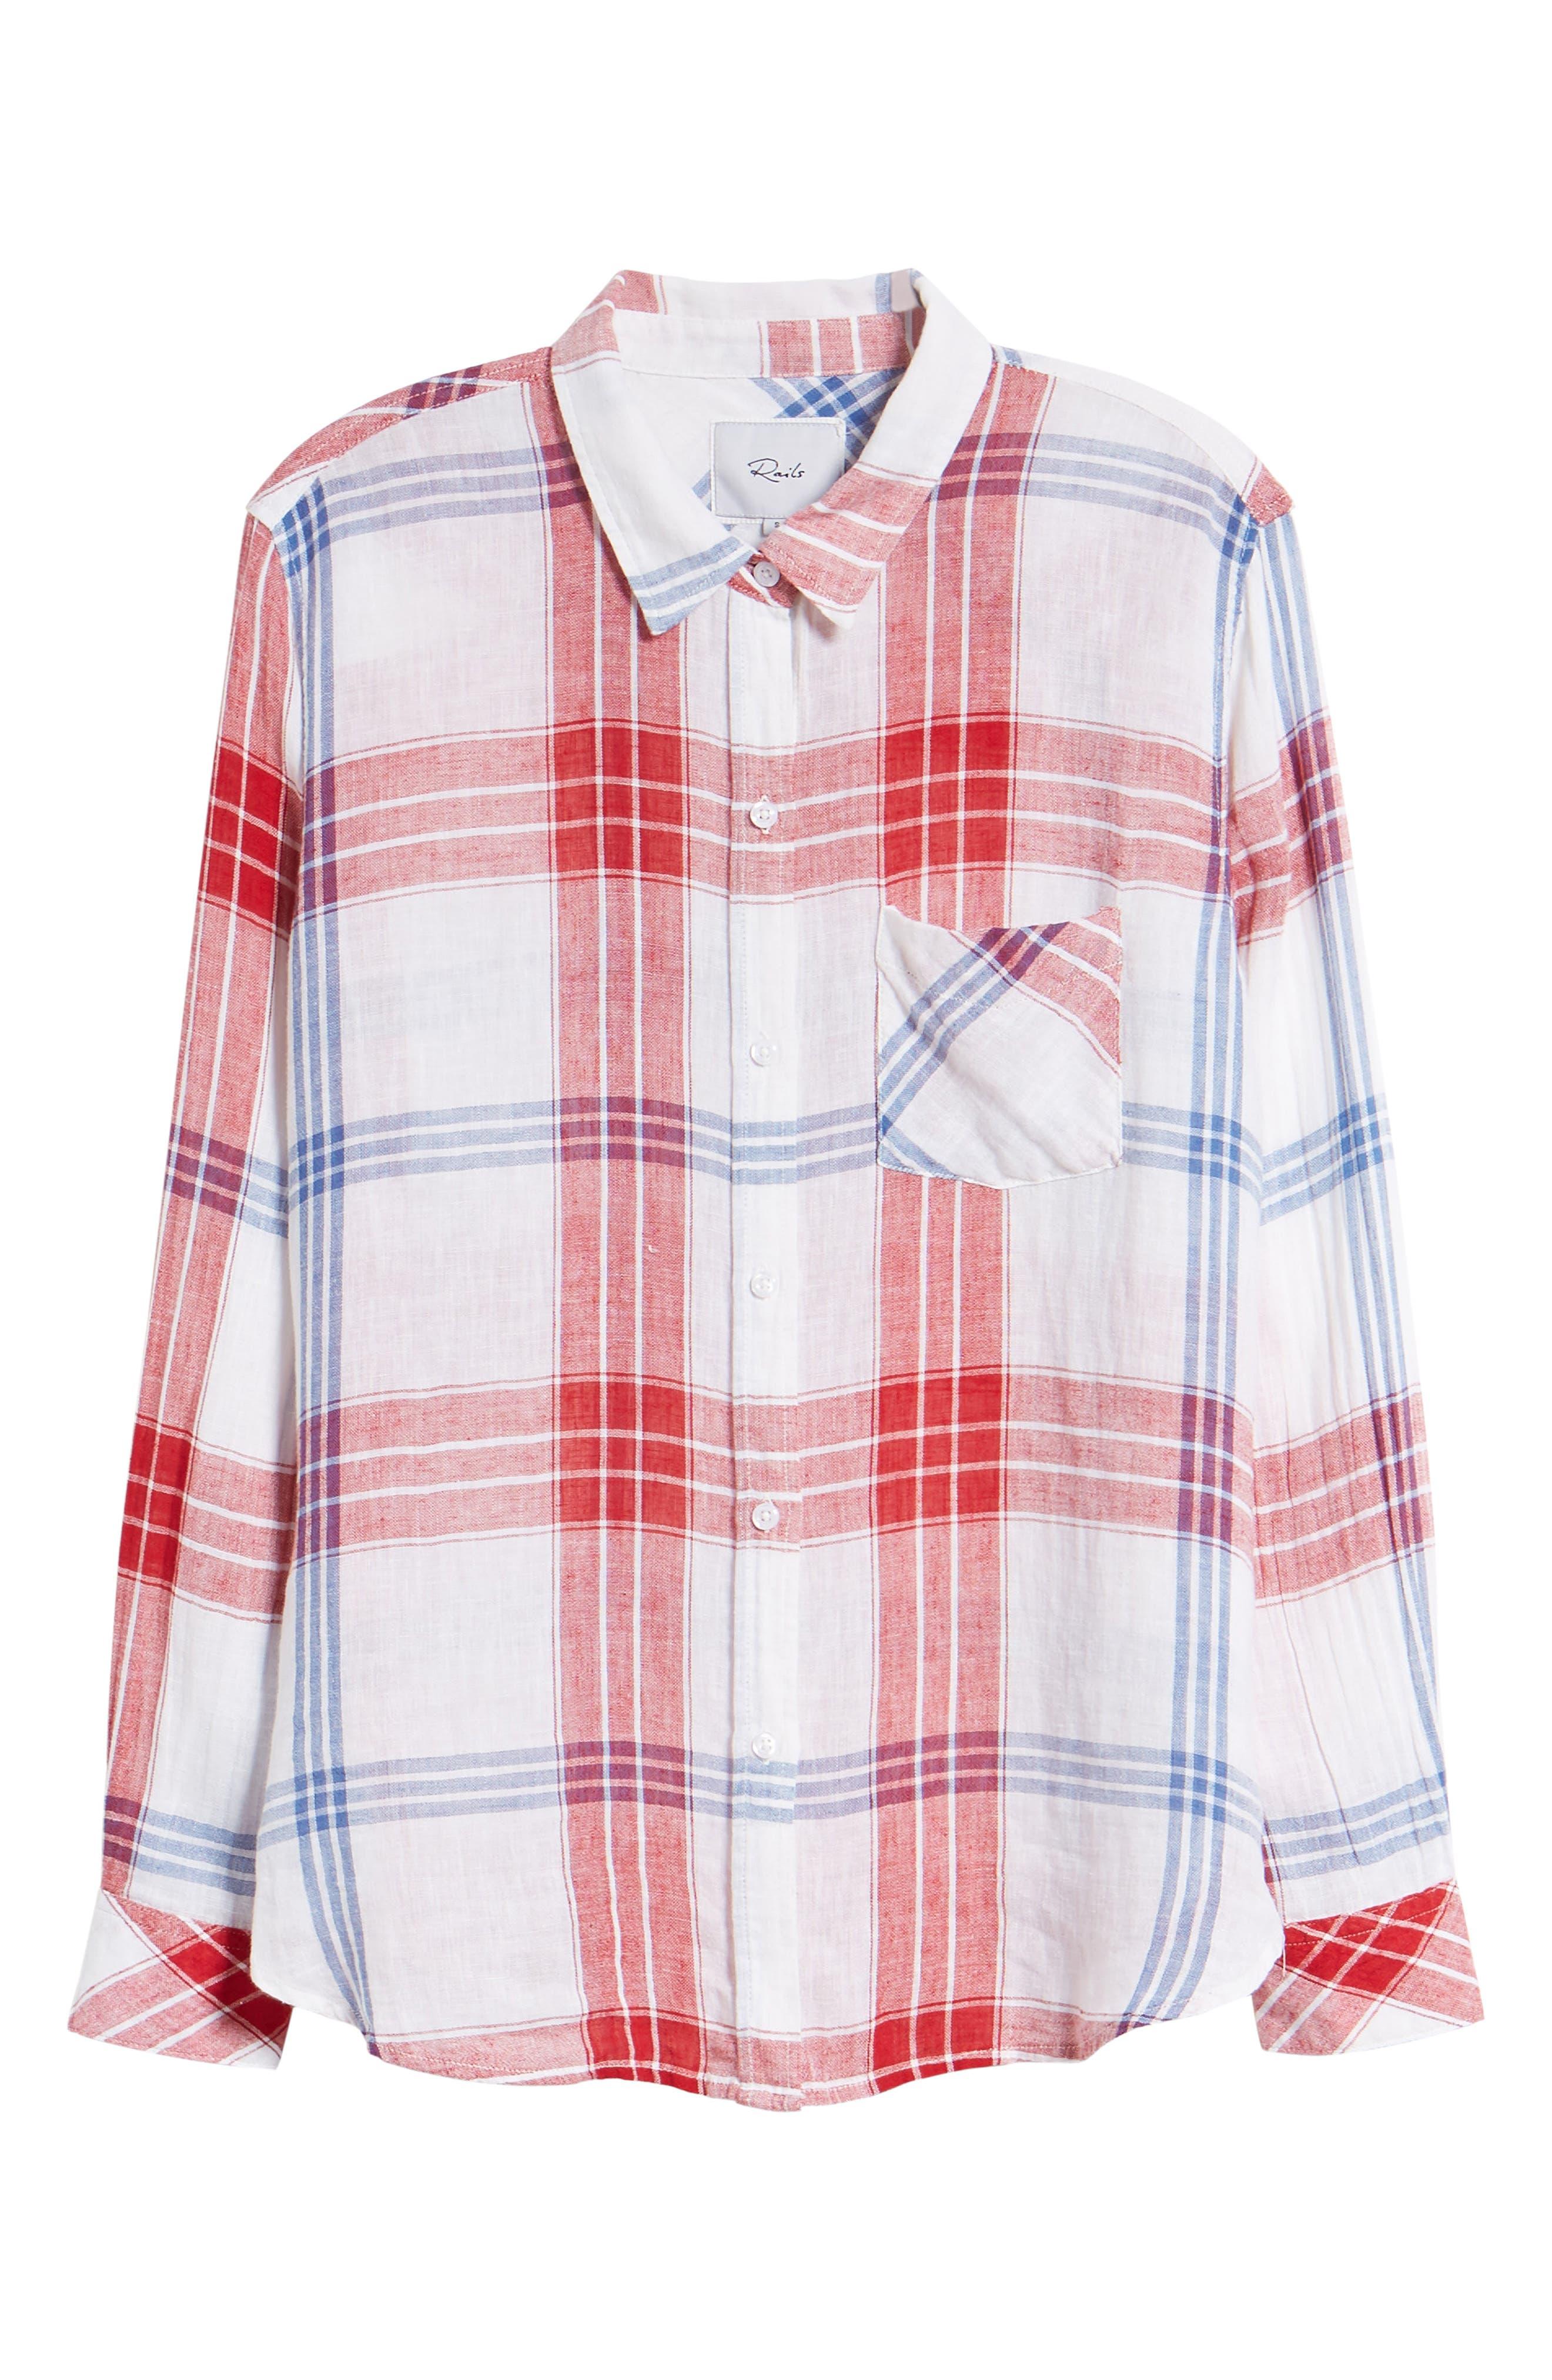 Charli Shirt,                             Alternate thumbnail 7, color,                             CARMINE BLUE WHITE